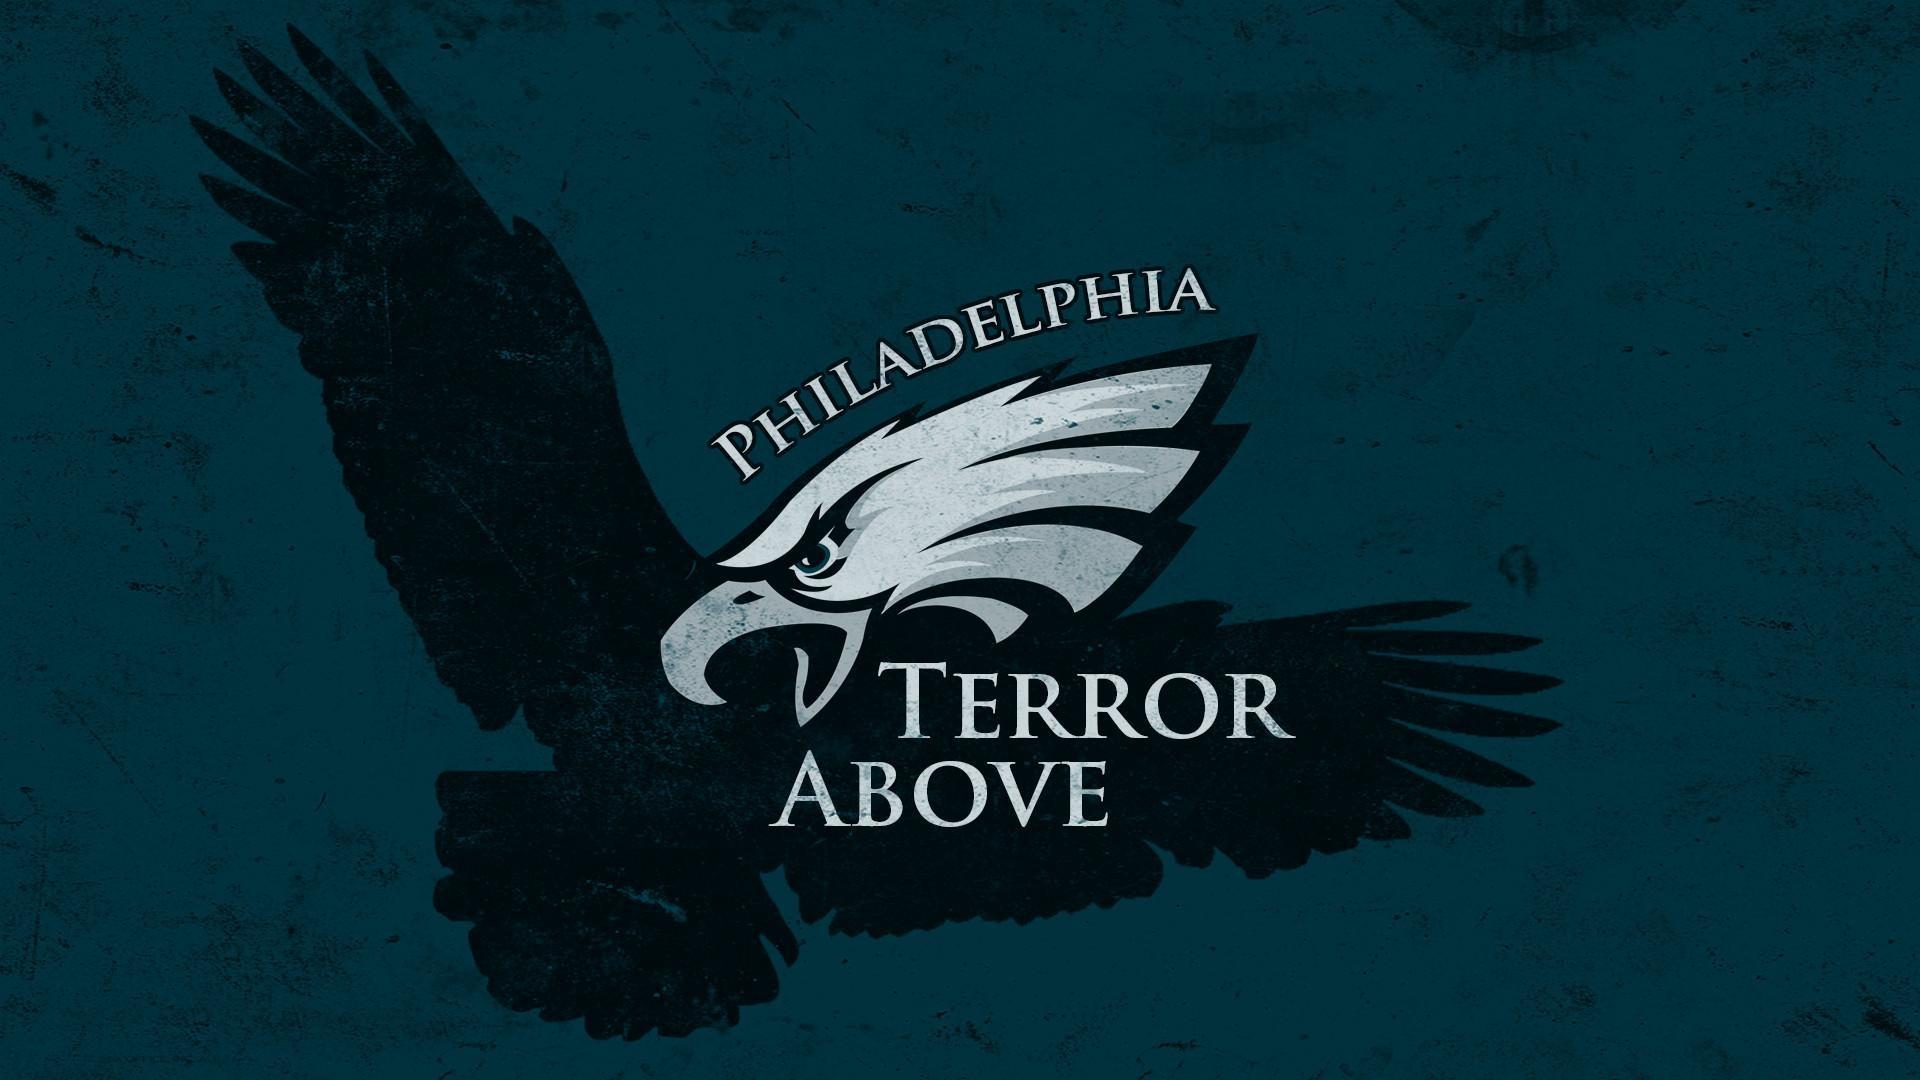 Philidelphia-Eagles-logo-wallpapers-HD-download